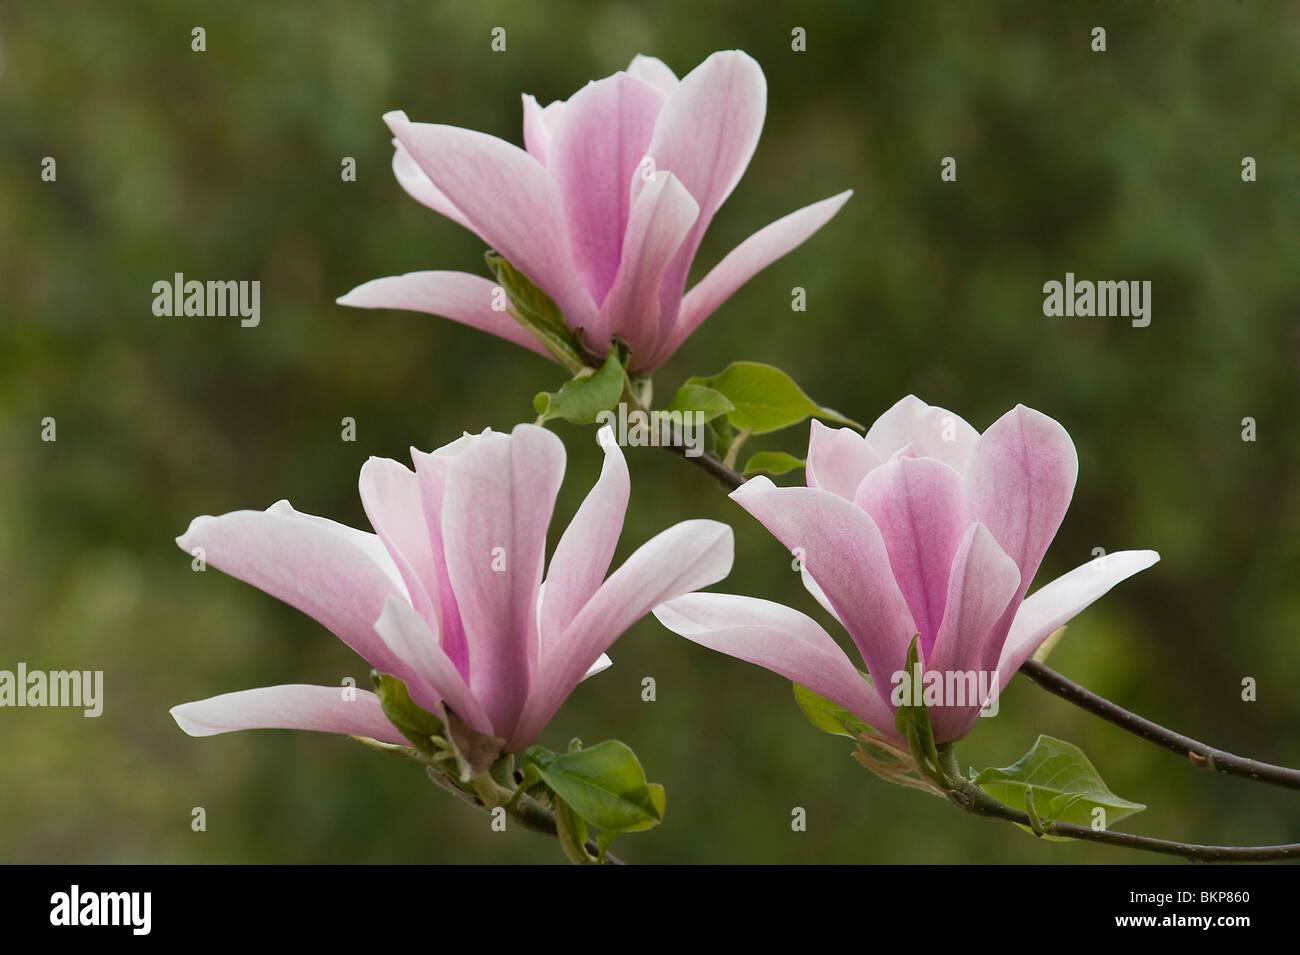 magnolia heaven scent eine sommergr ne magnolie stockfoto bild 29378216 alamy. Black Bedroom Furniture Sets. Home Design Ideas